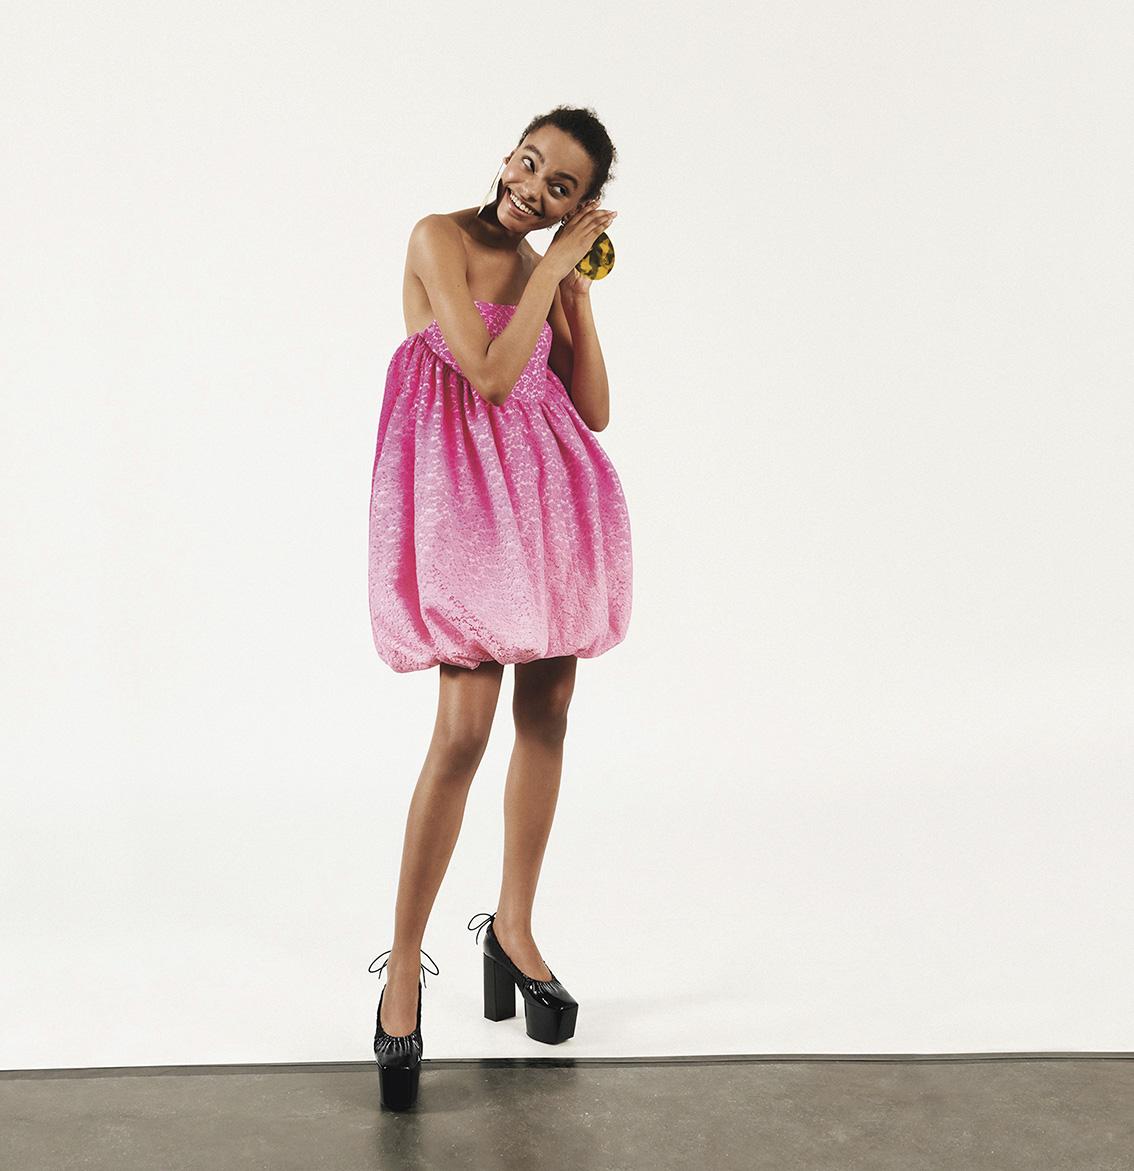 Robe rose en dentelle créée par Guillaume Henry pour Patou, printemps 2020.© PATOU-KIRA-BUNSE